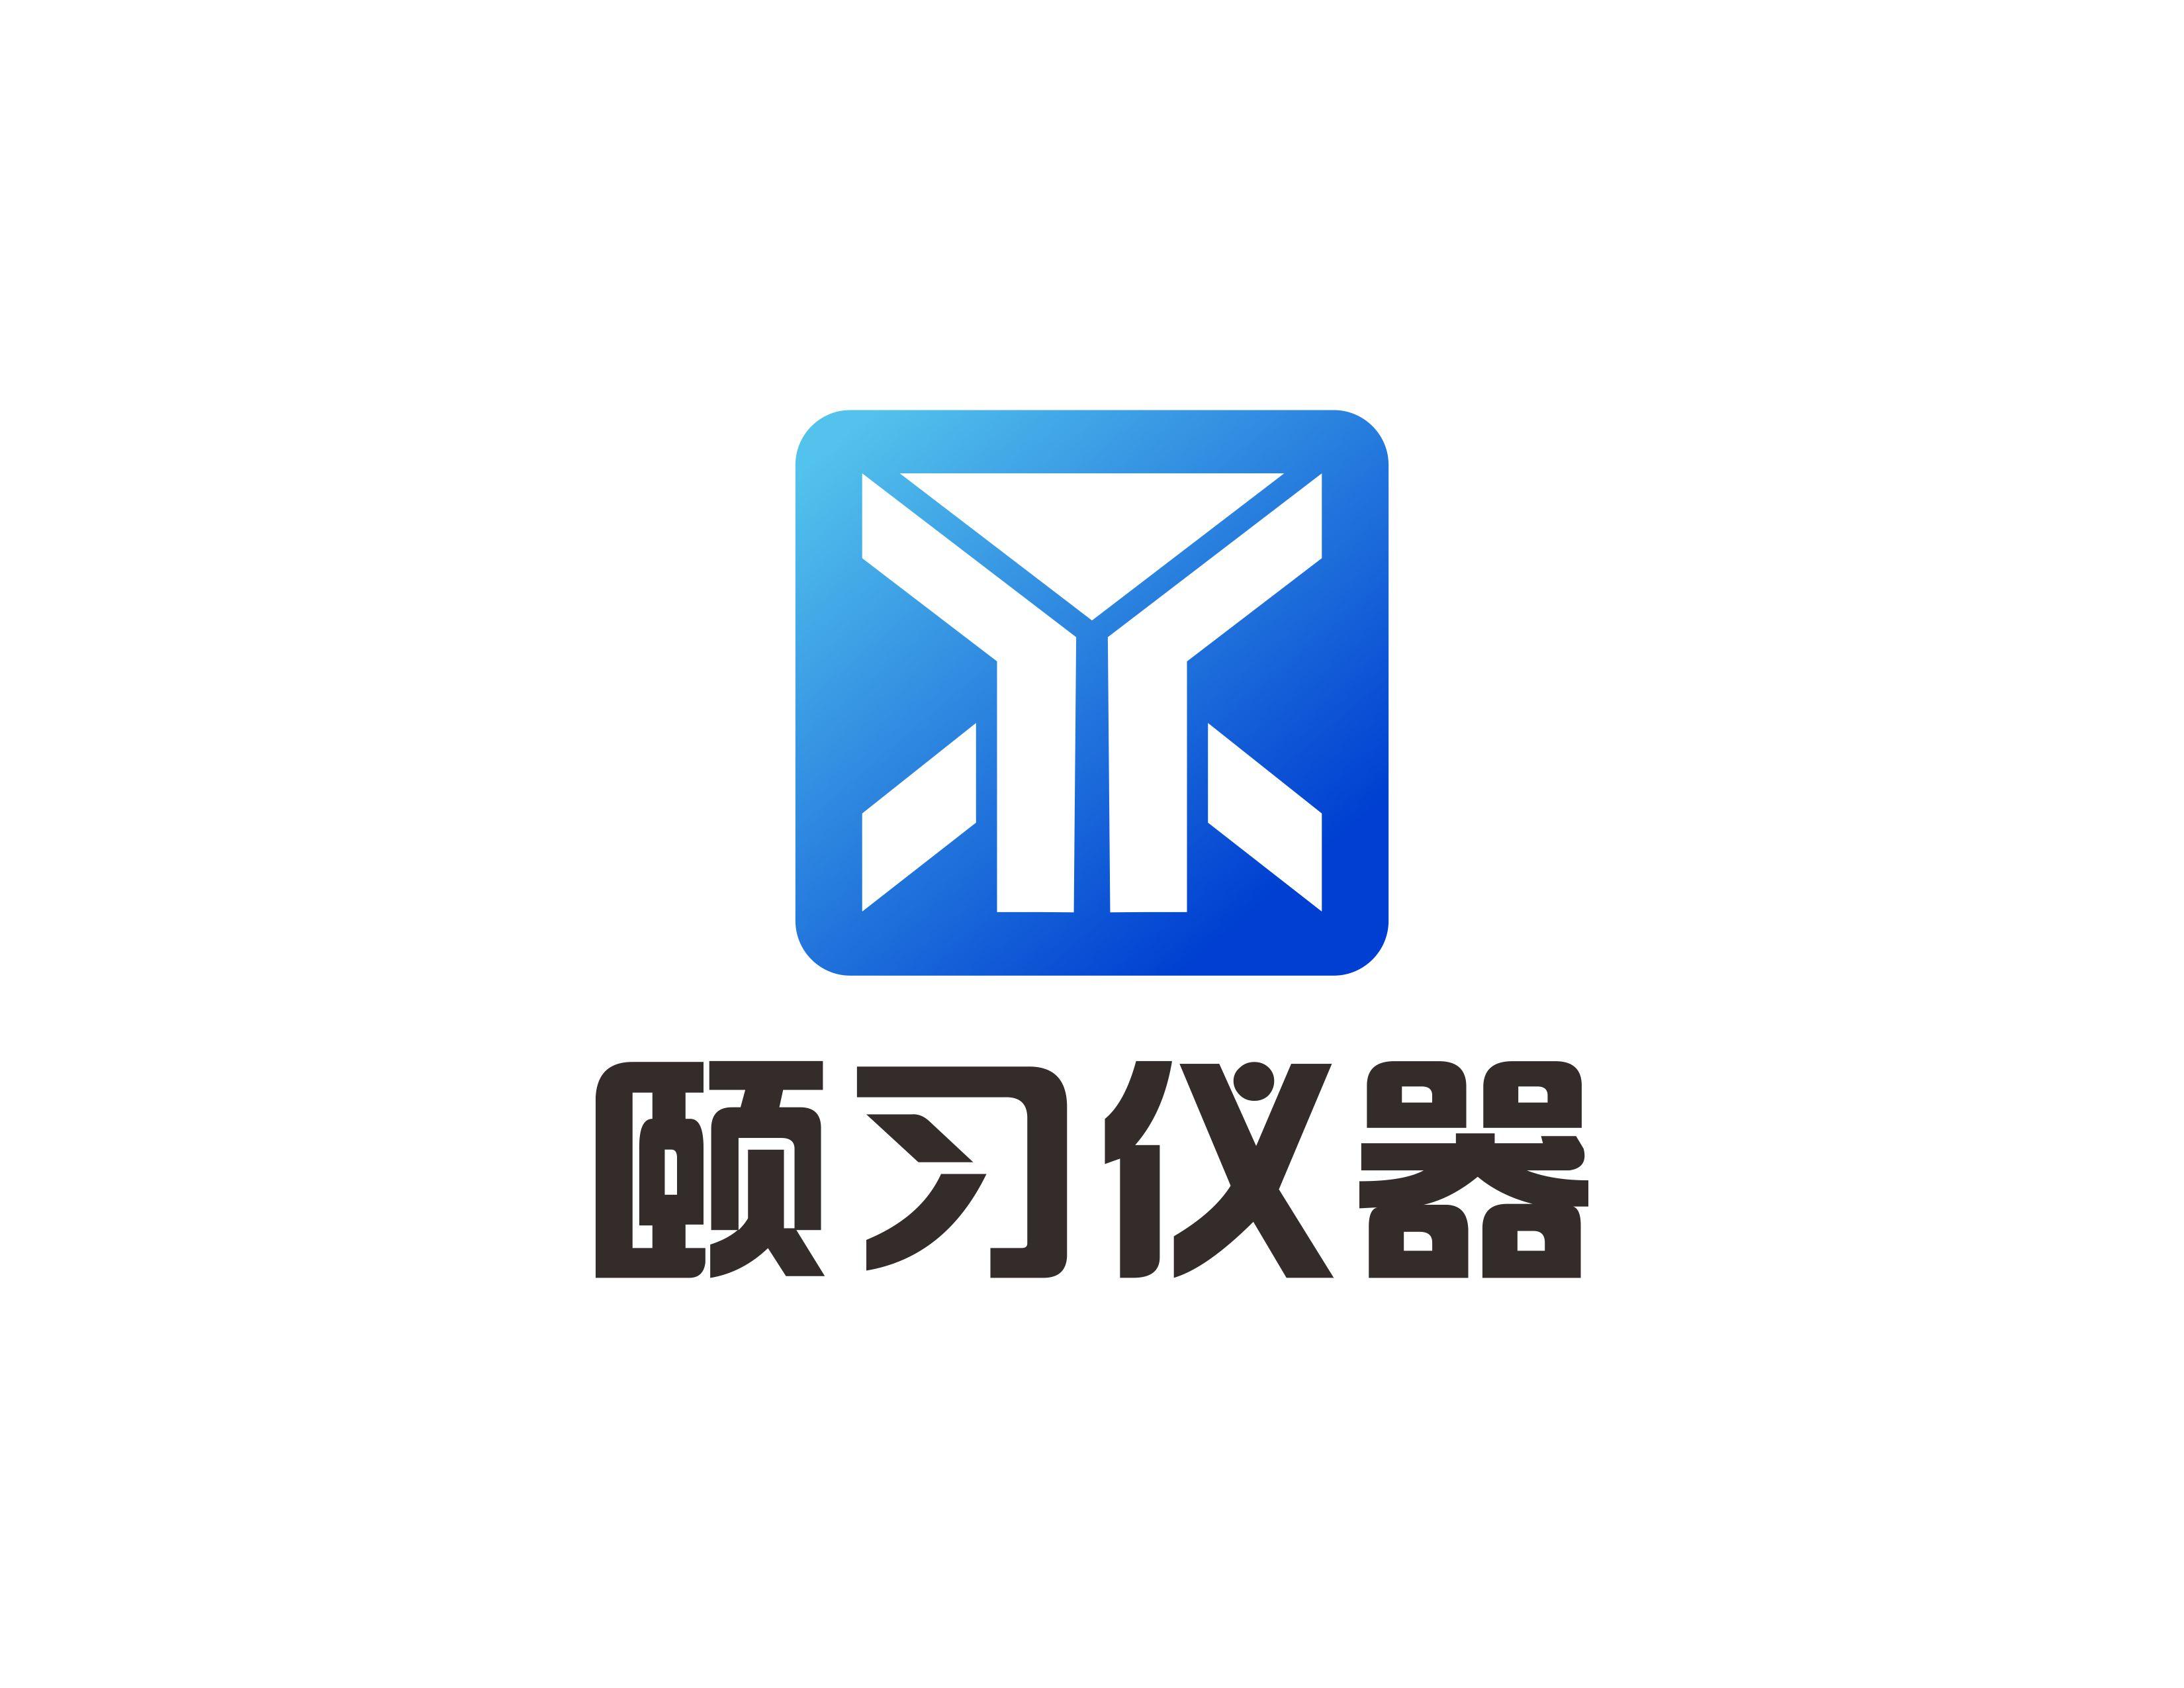 logo logo 标志 设计 图标 3300_2550